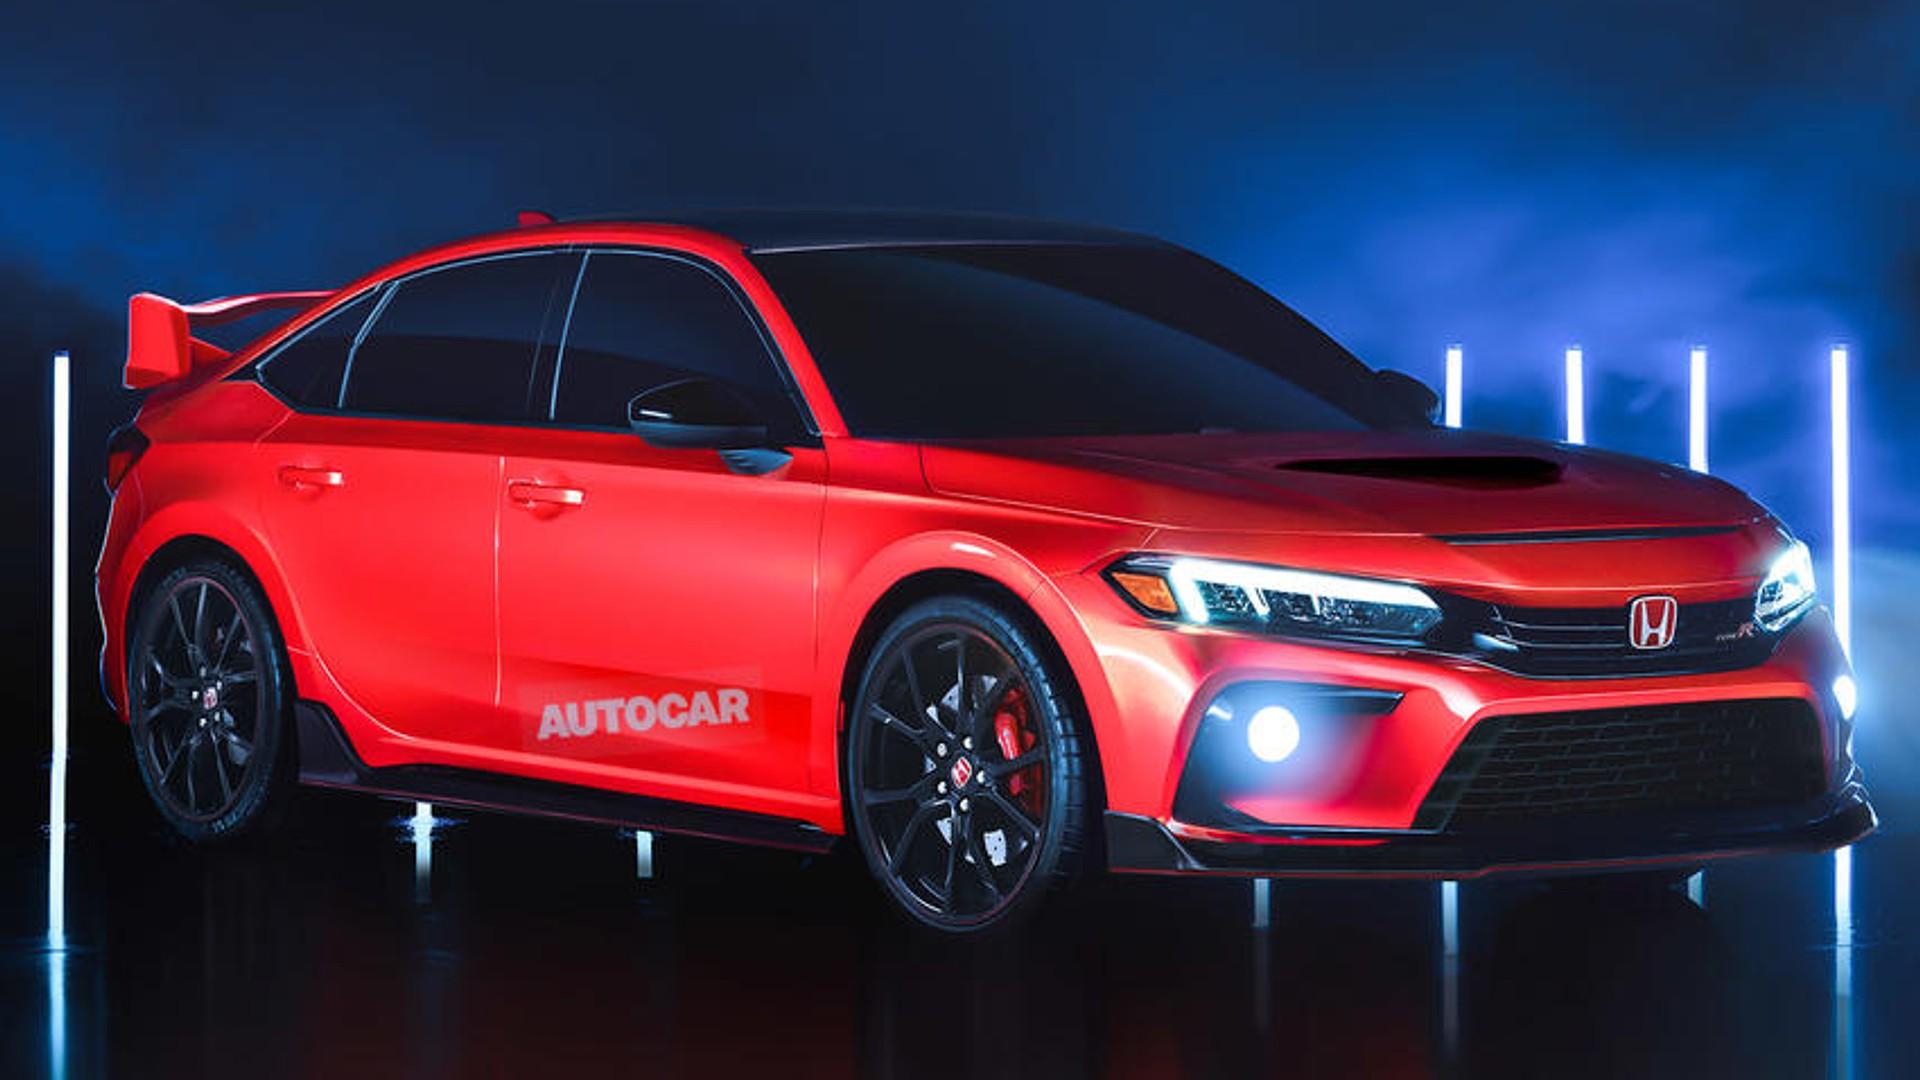 Civic Type R: Ίσως το τελευταίο μη-υβριδικό μοντέλο της Honda